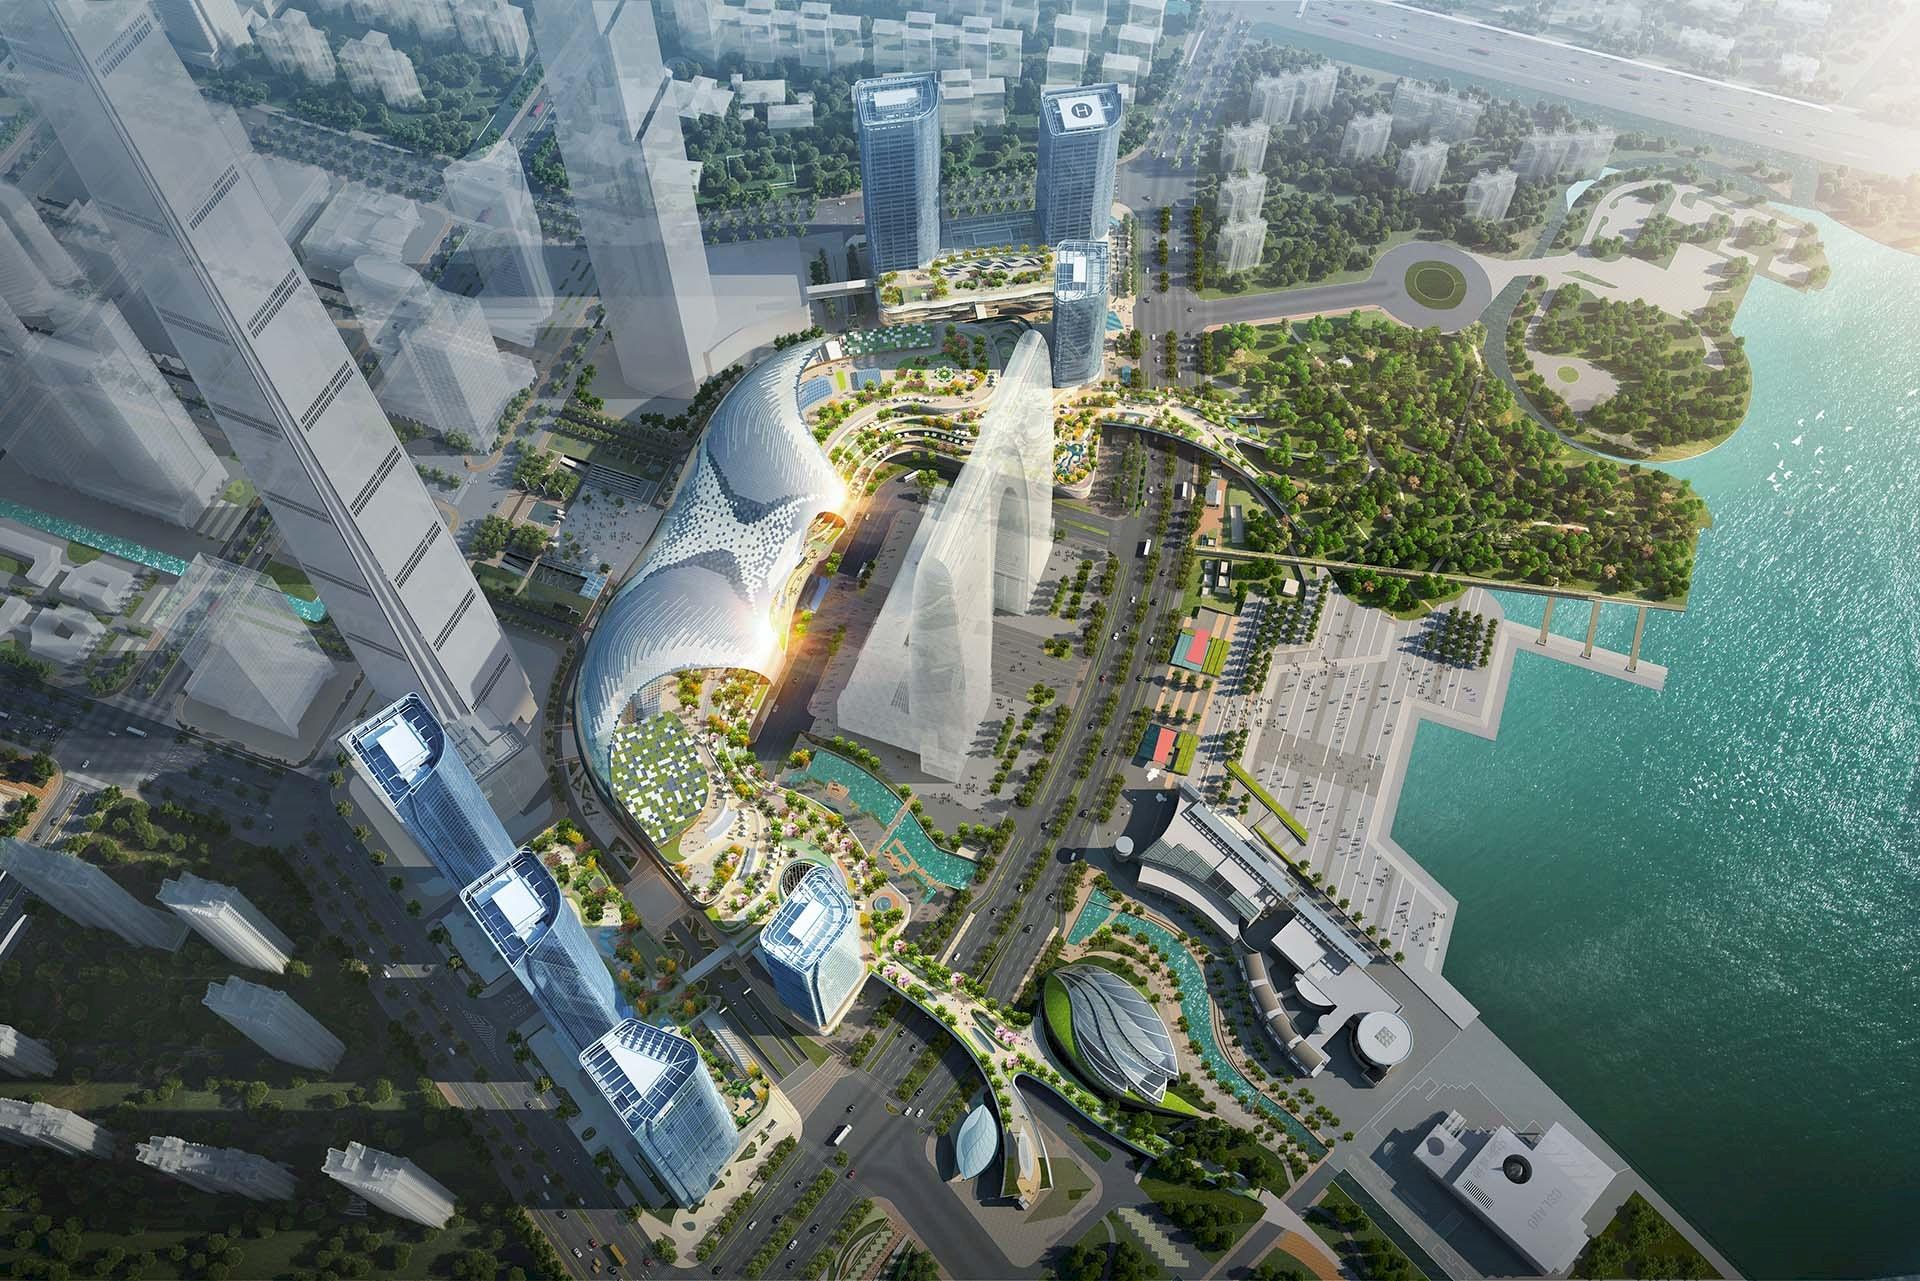 Suzhou Center